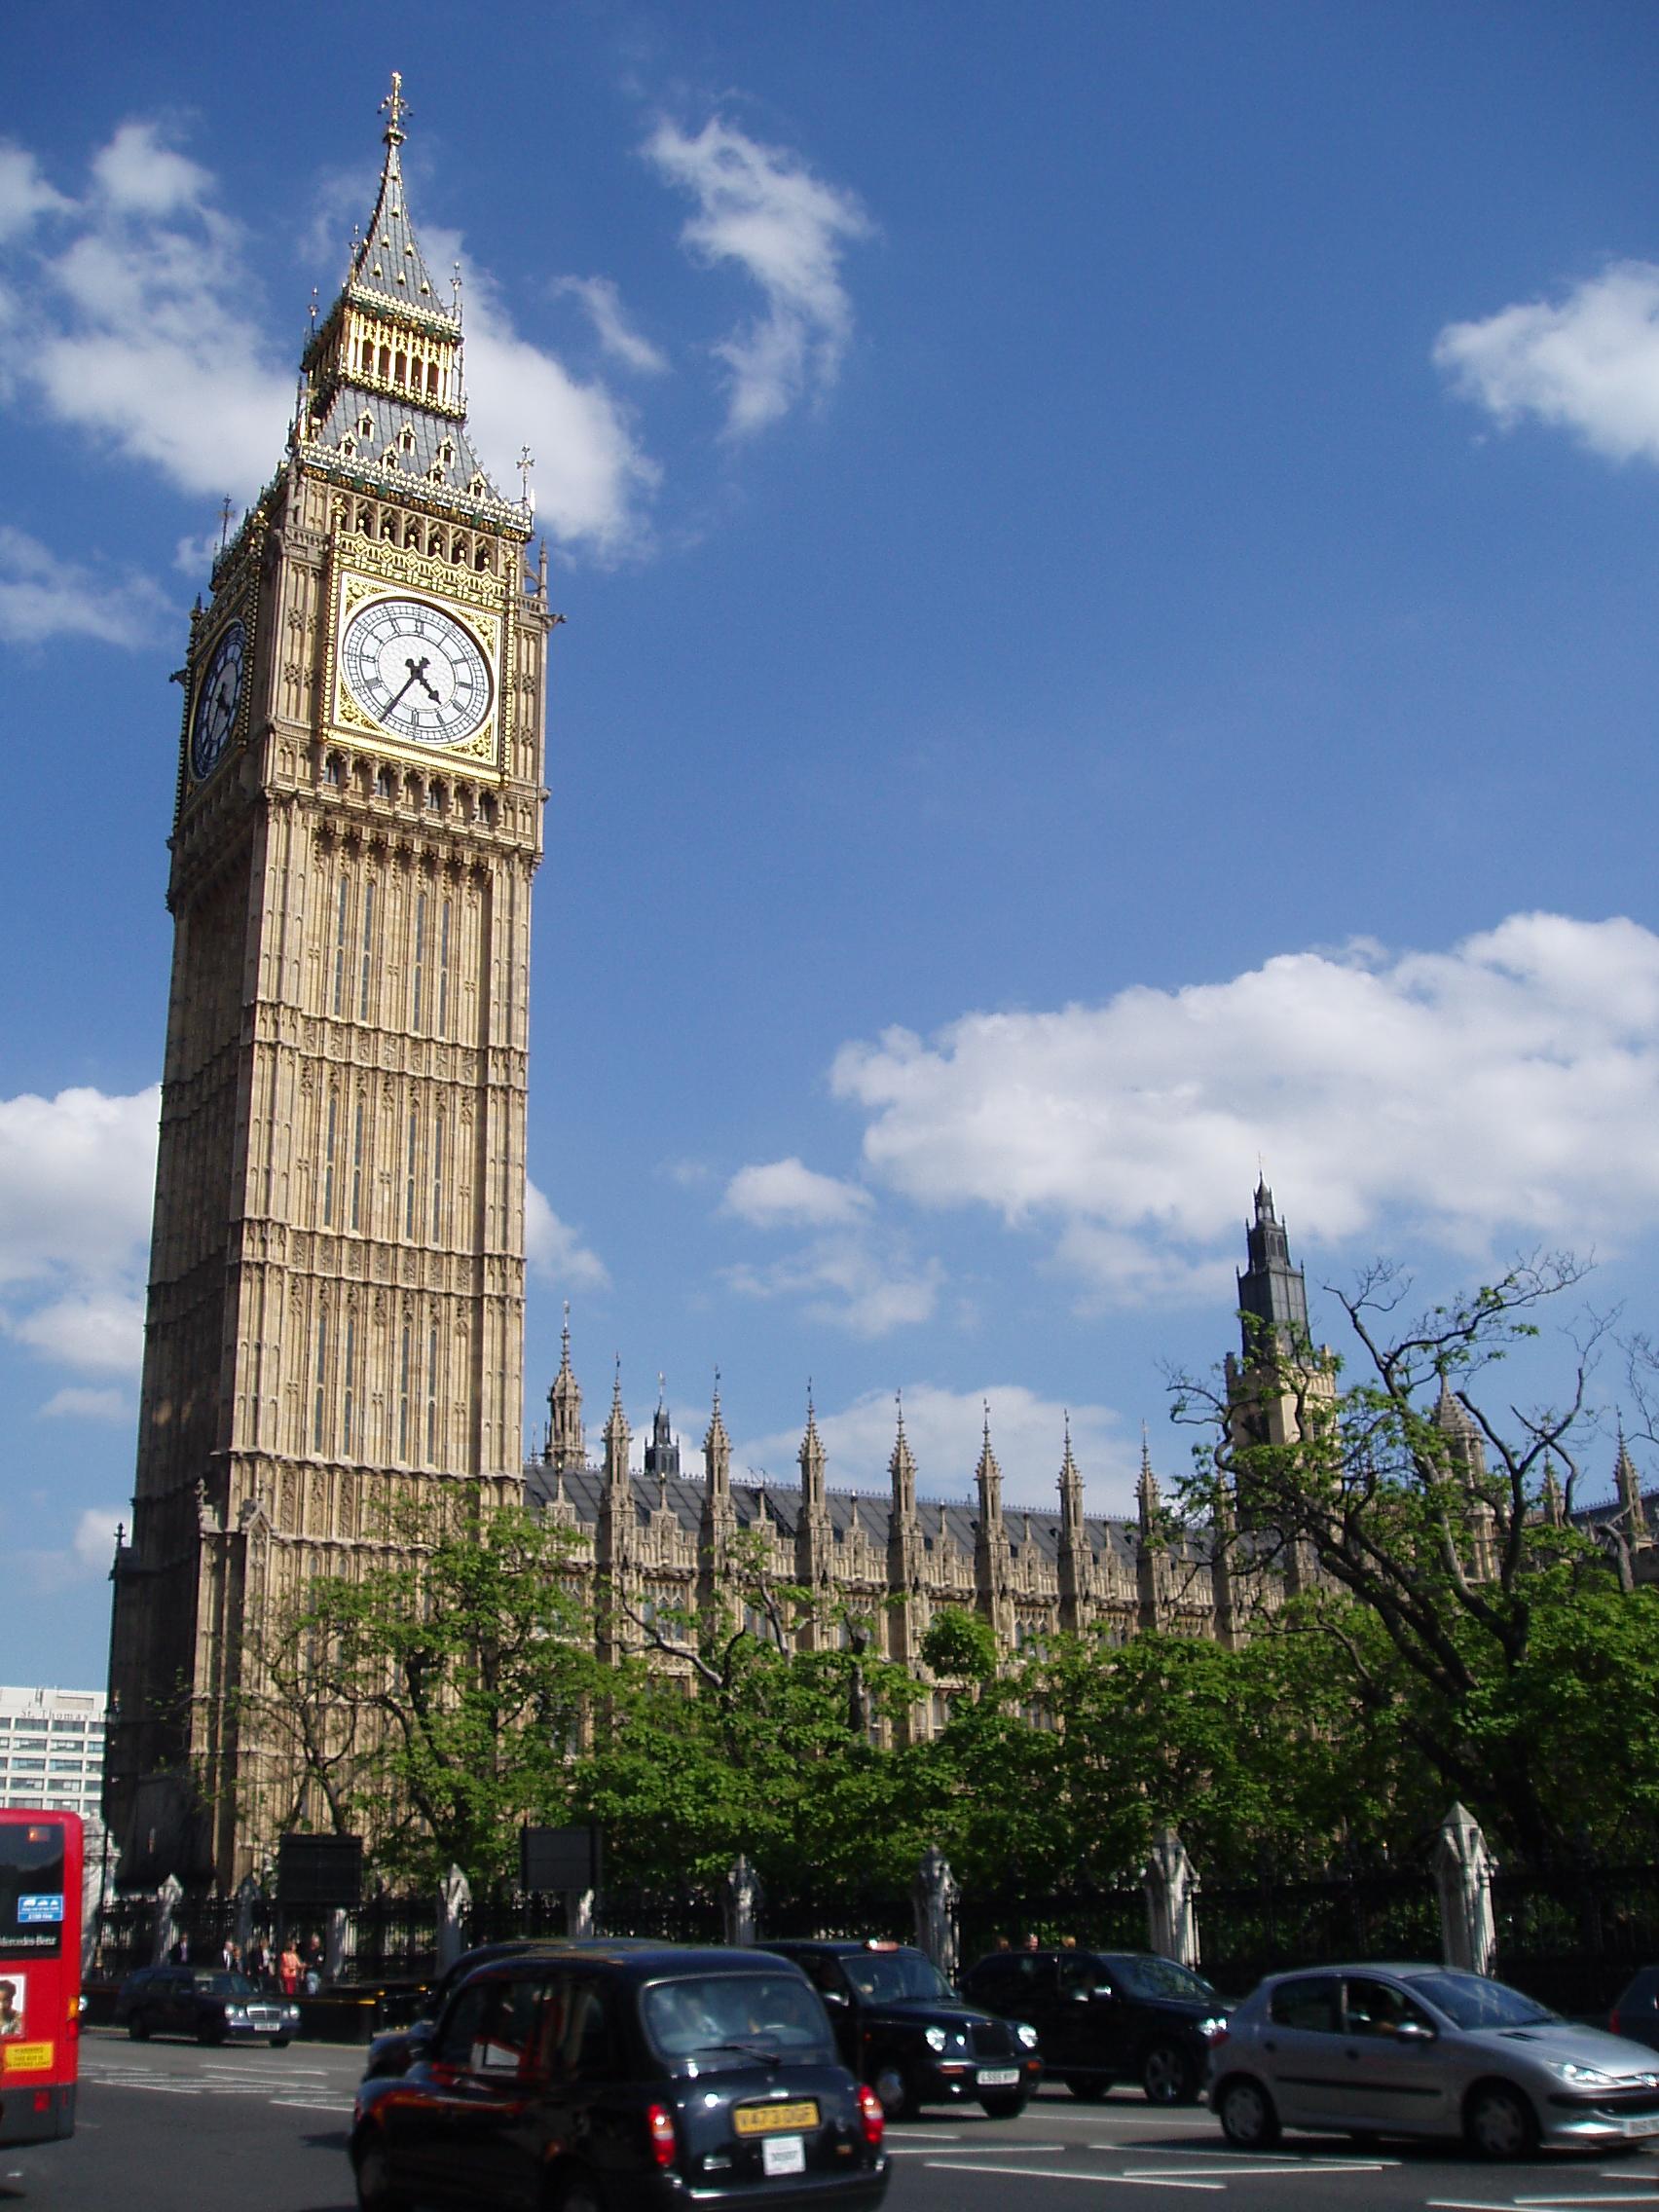 Description london big ben clocktower palace of westminster